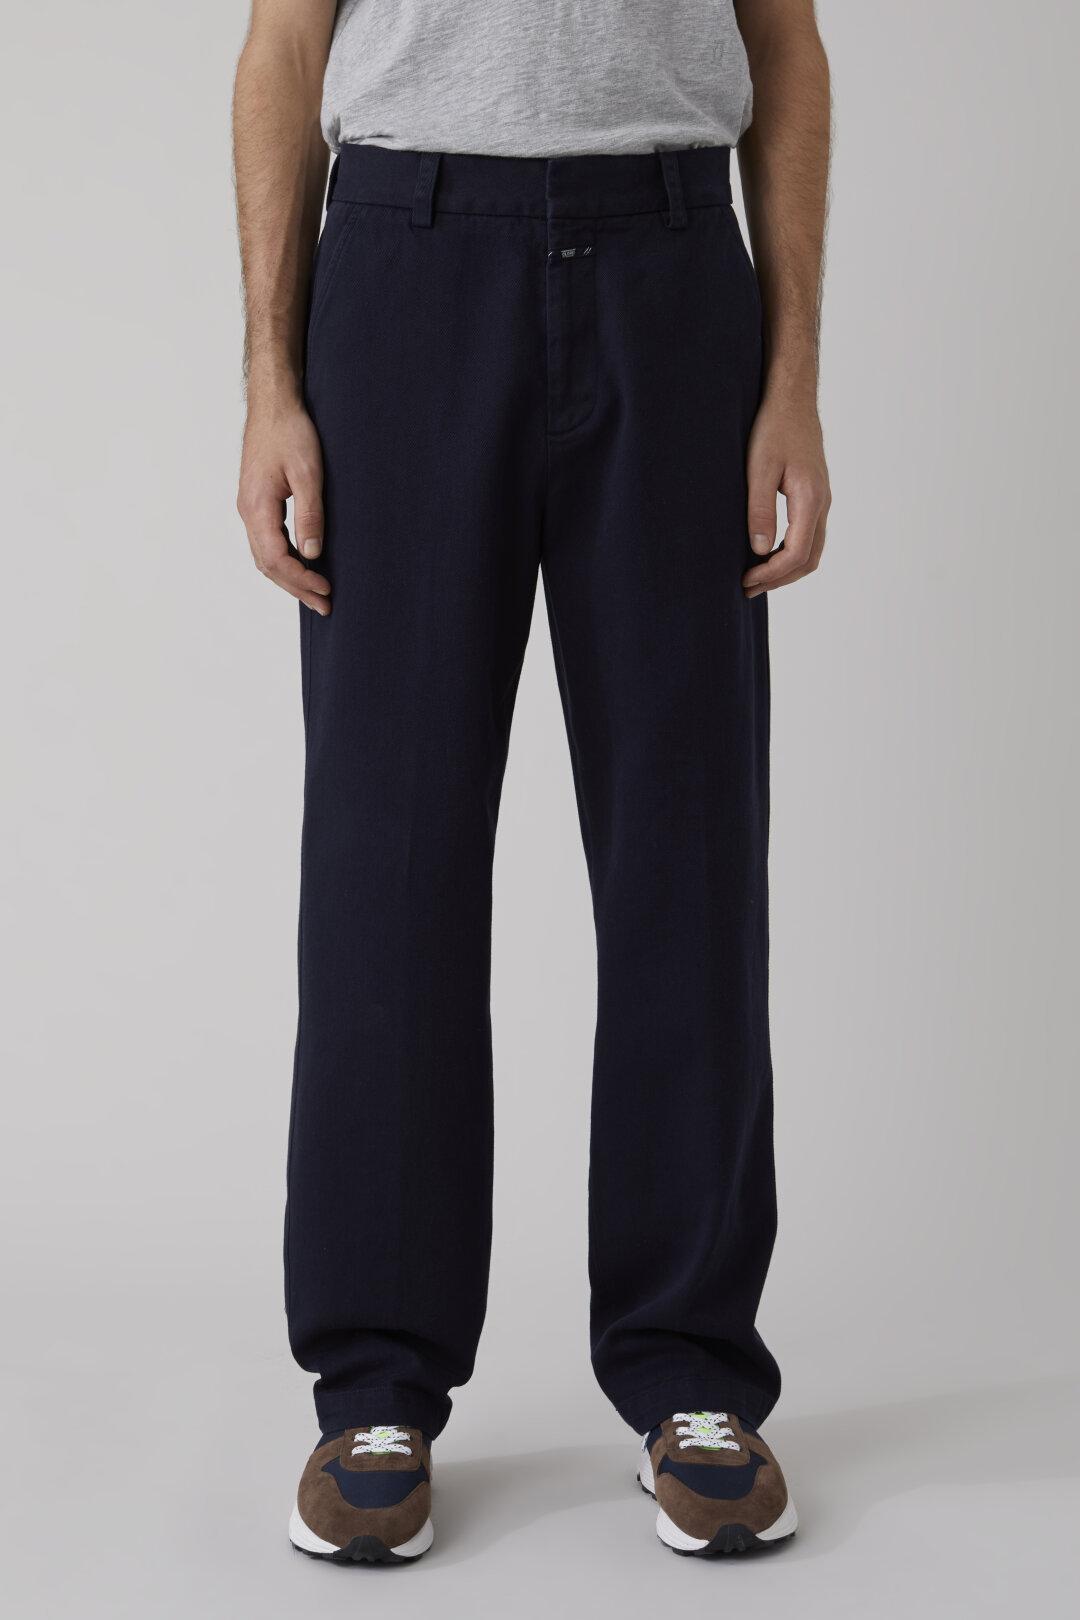 Widey Wide Pants